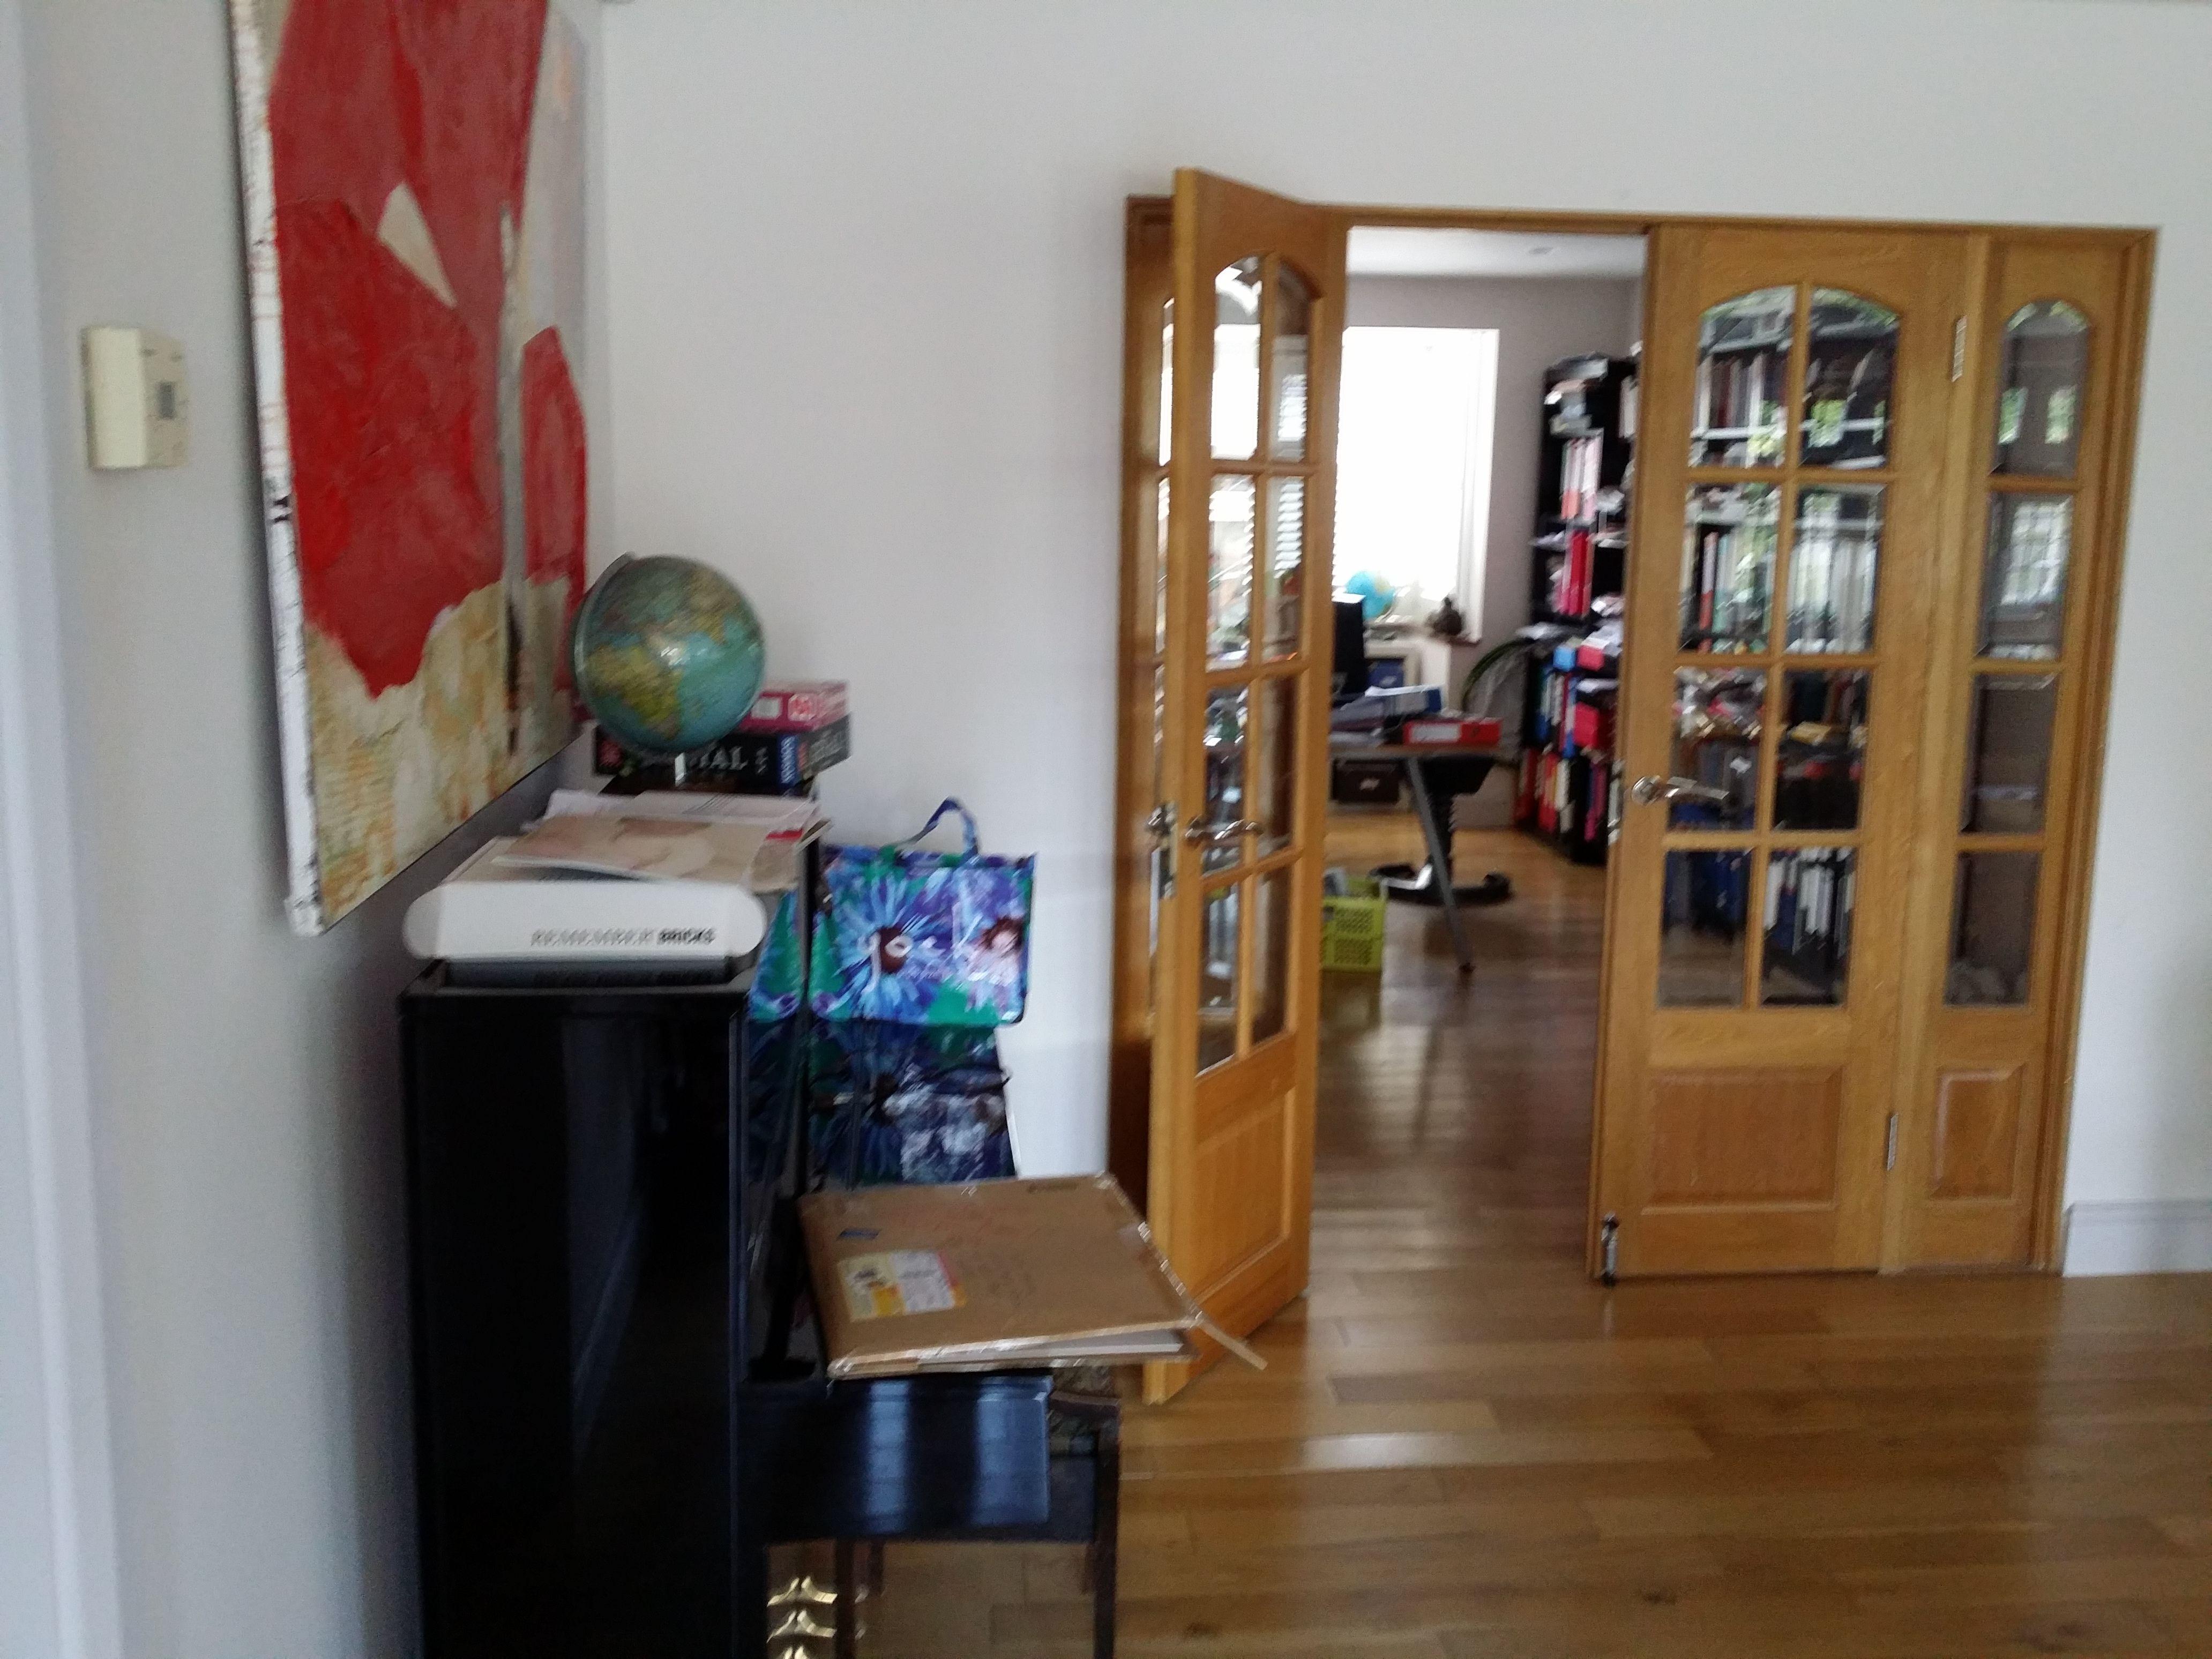 Existing Door into House